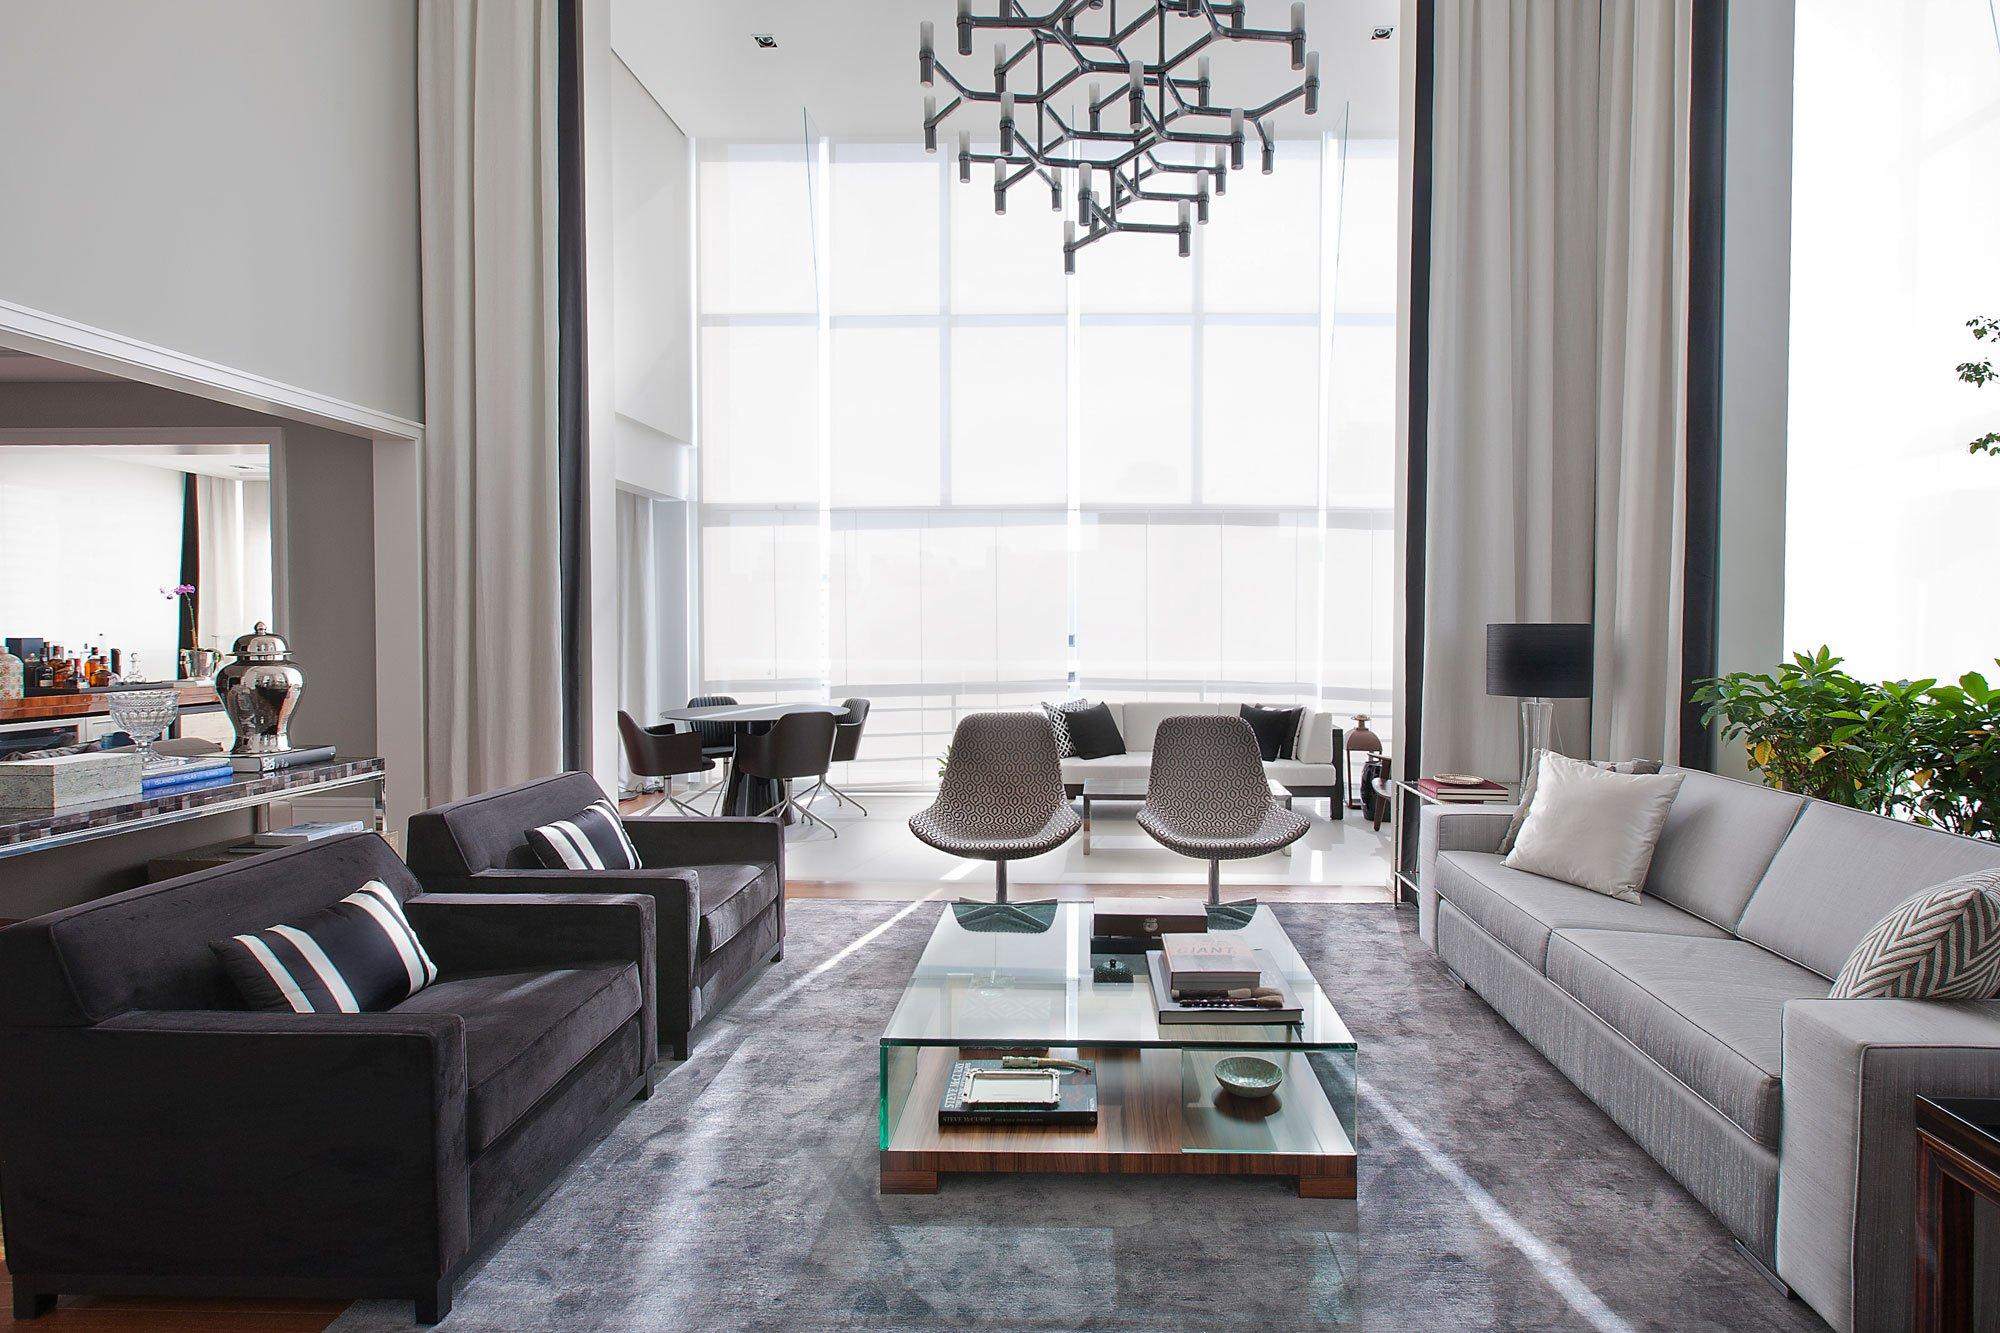 An-Elegant-Interior-04